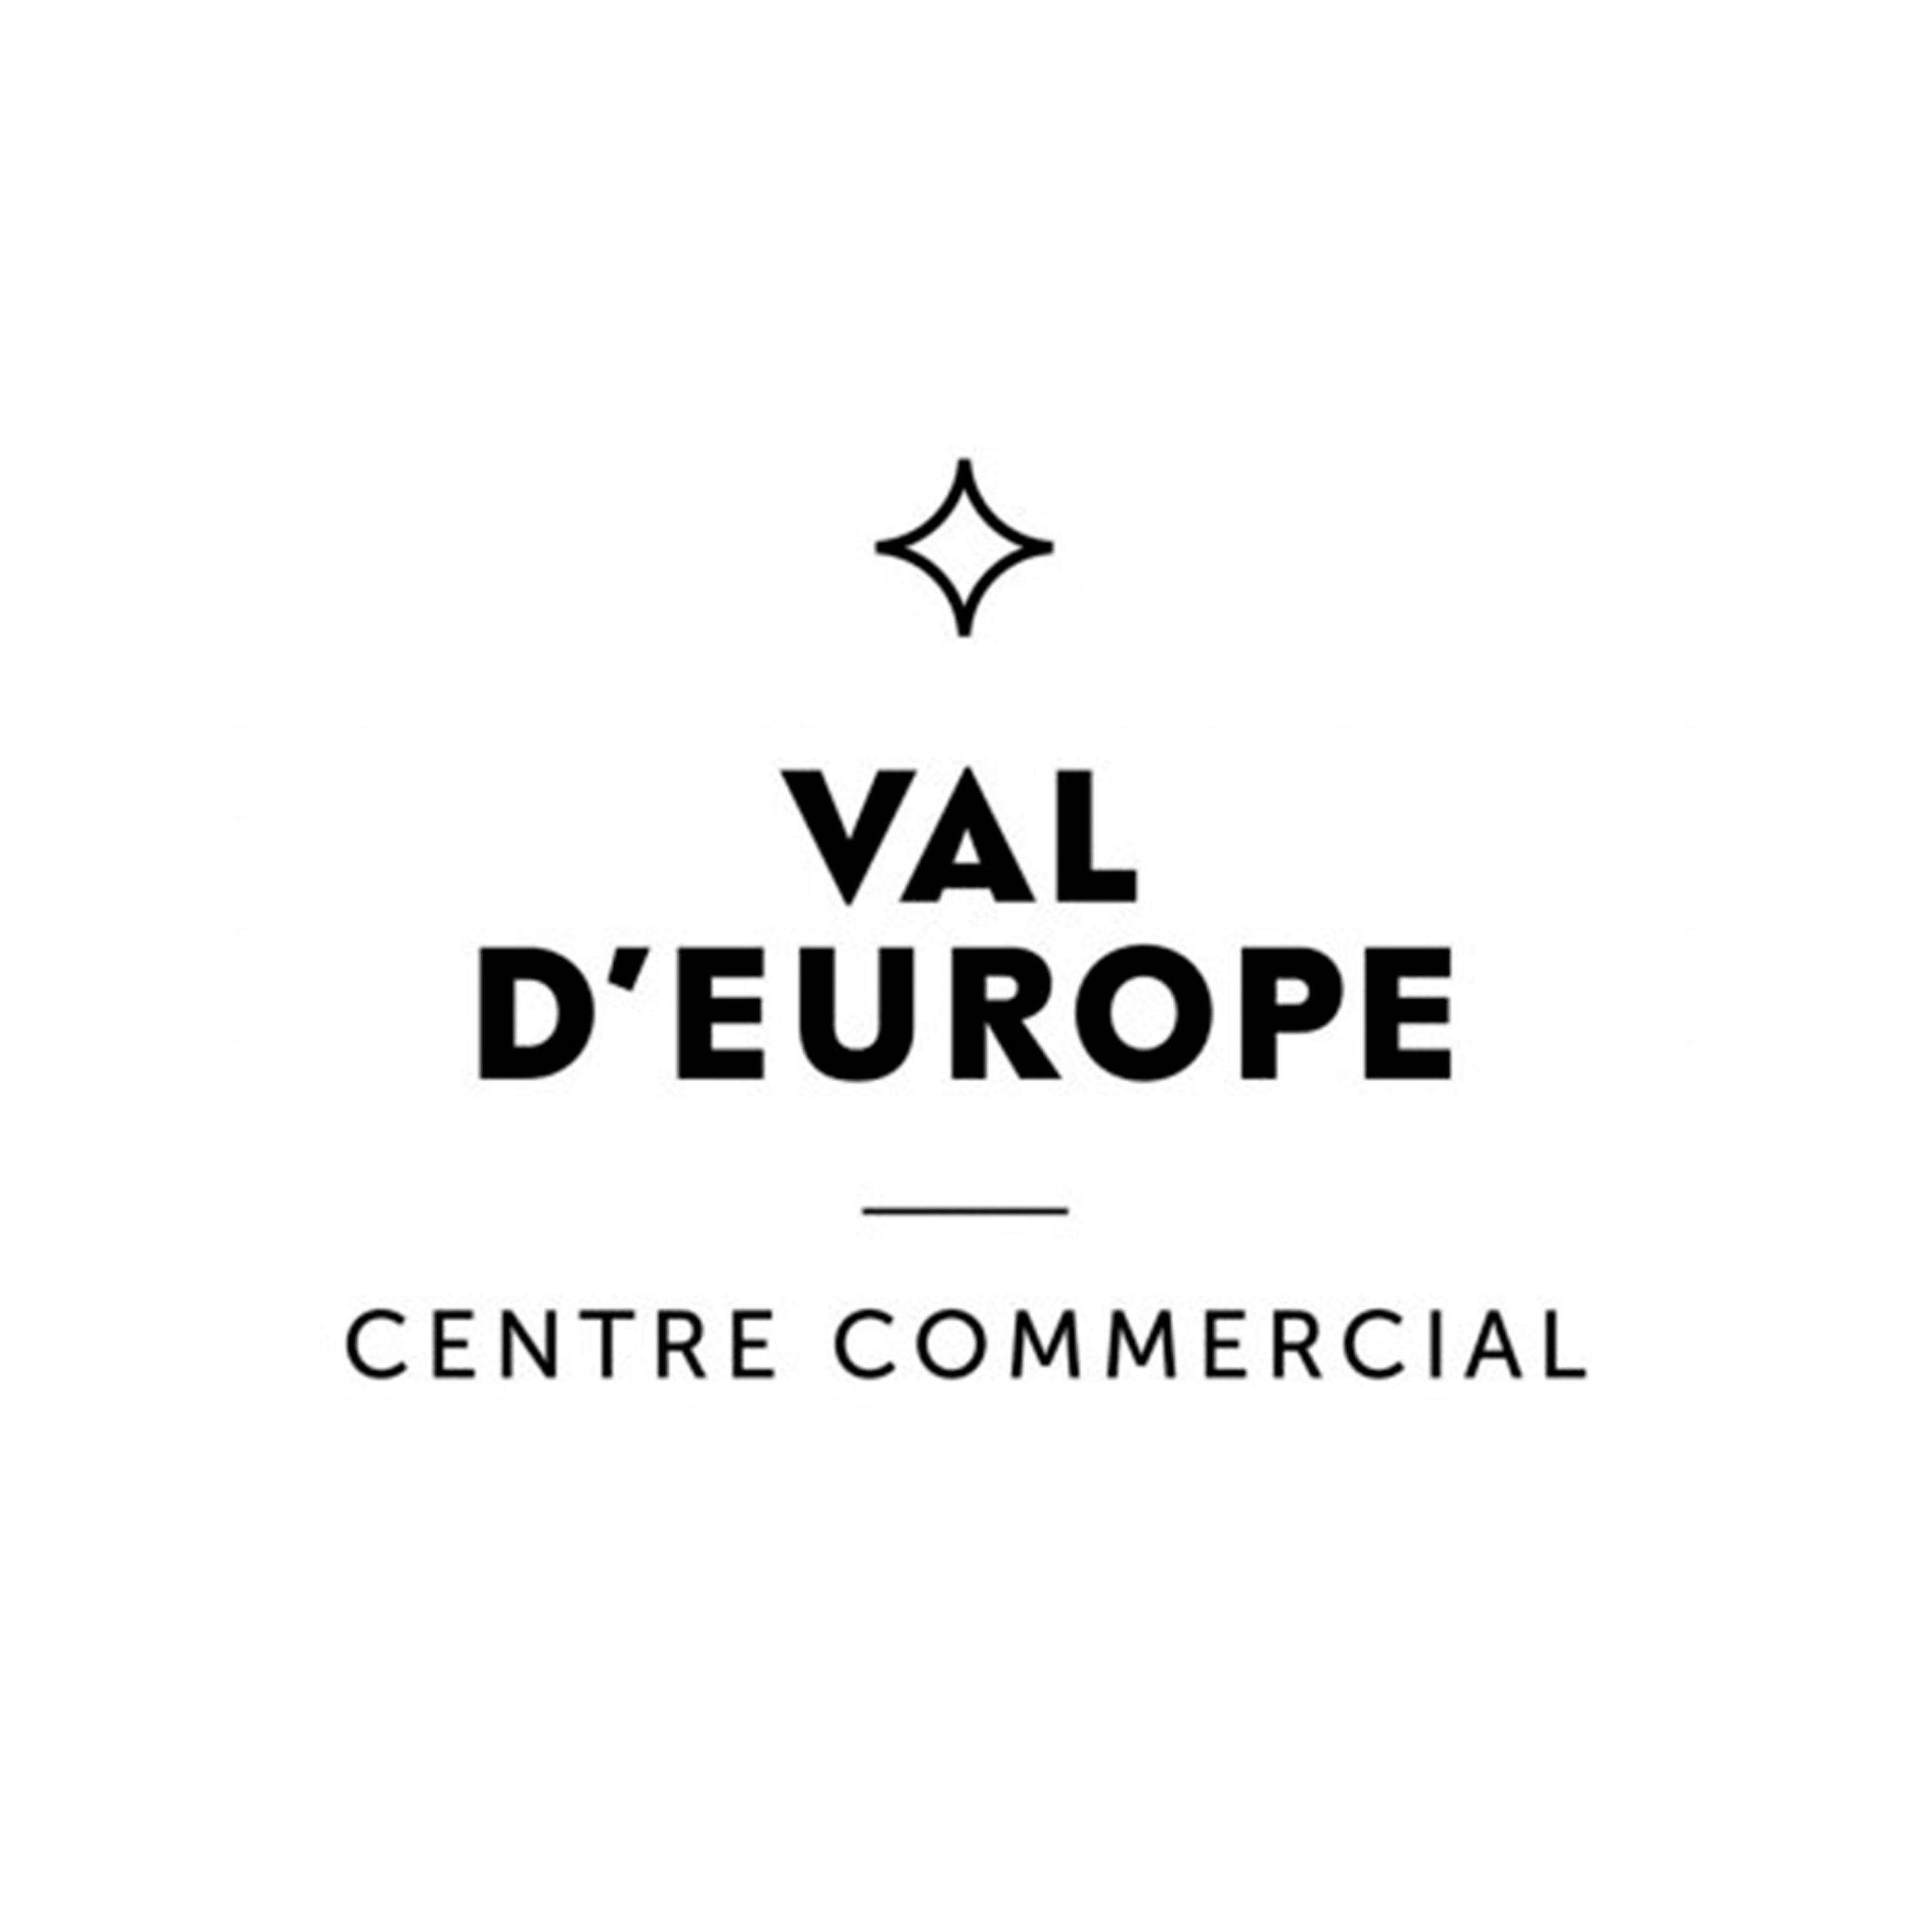 val d'europe-logo